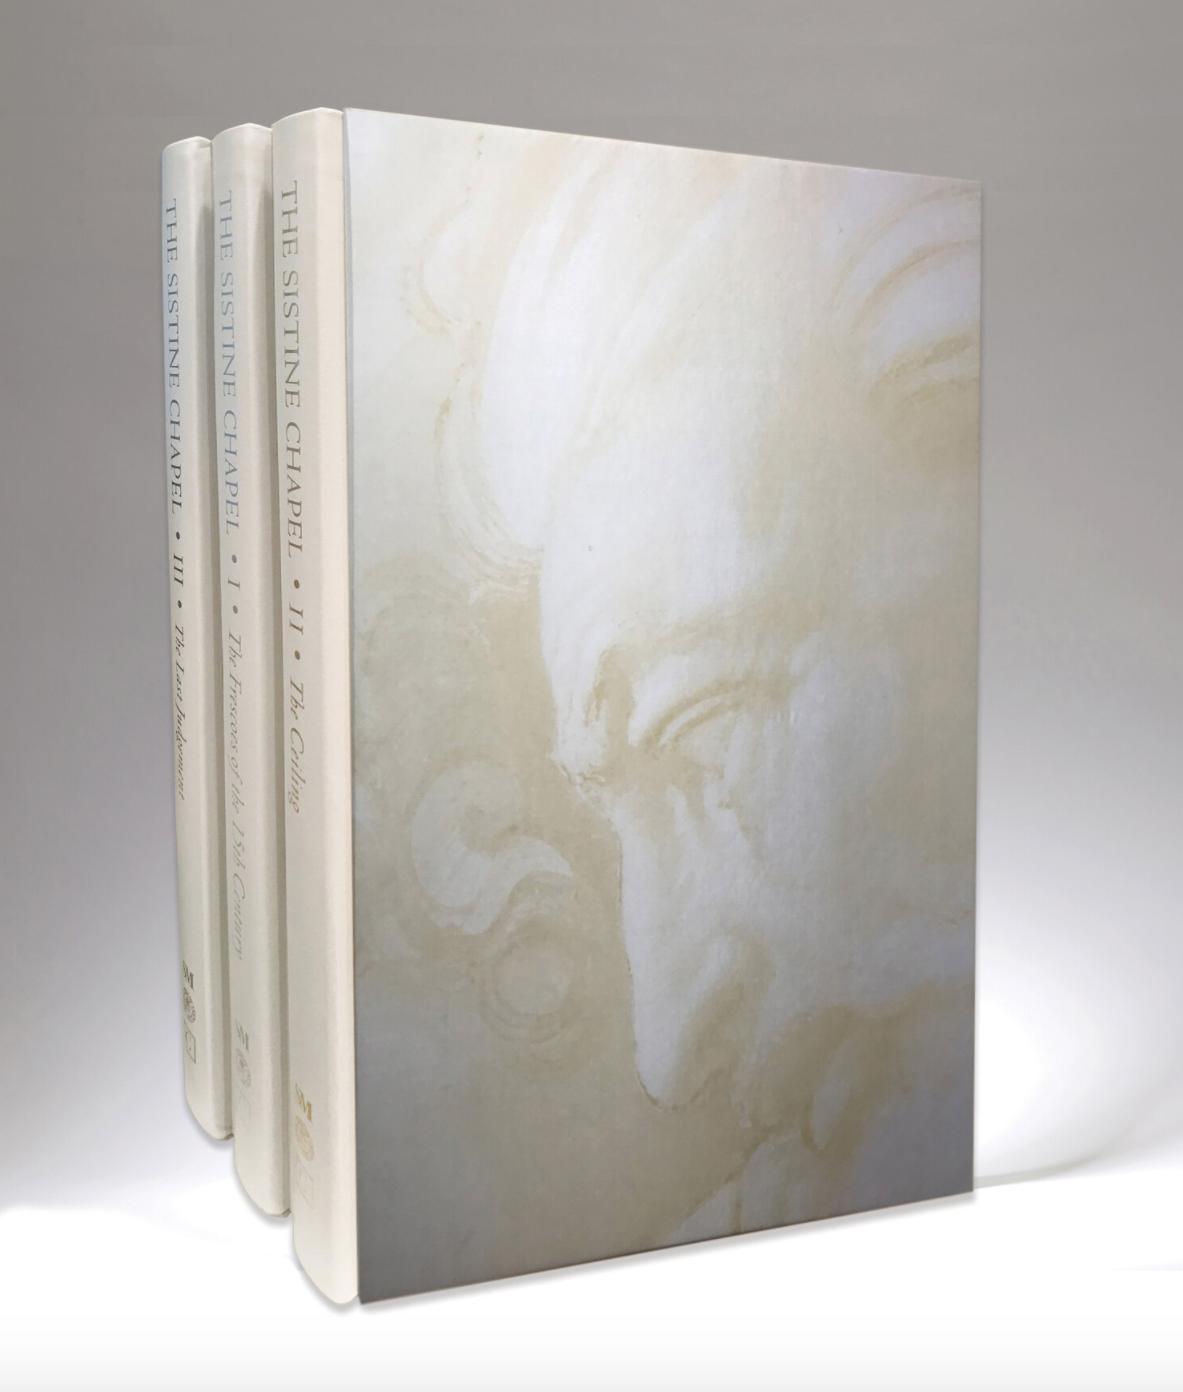 Image Setalux® cover for the precious frescoes of the Sistine Chapel